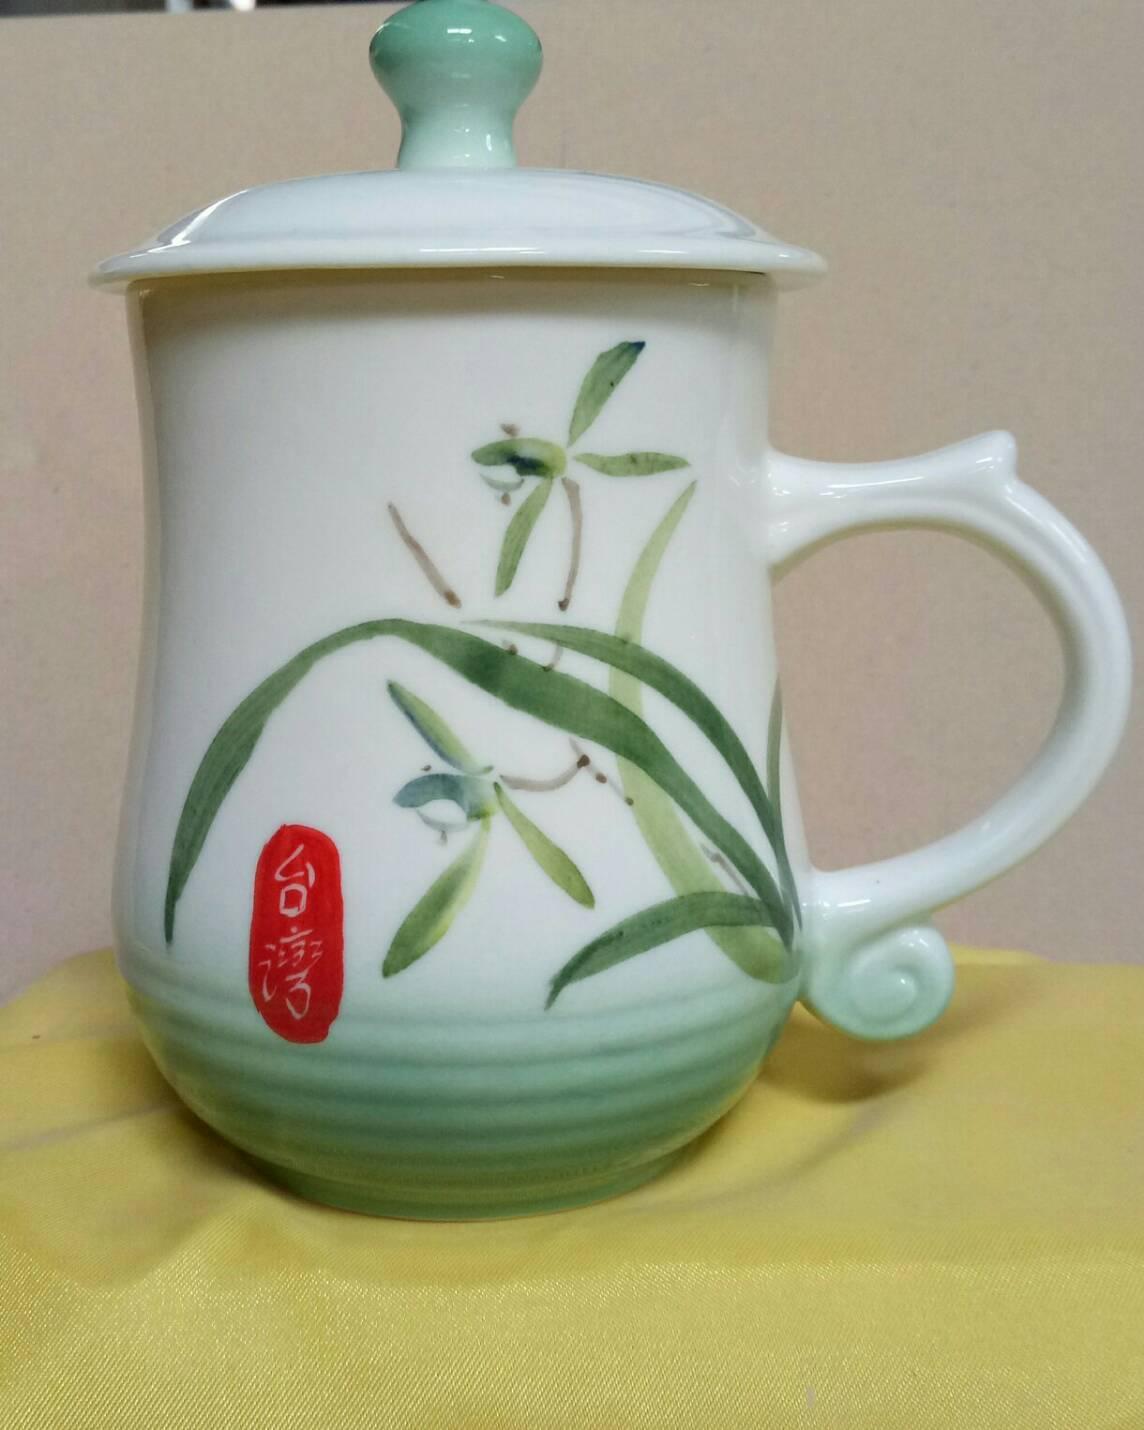 BQ09 彩繪杯 陶瓷杯彩繪杯子